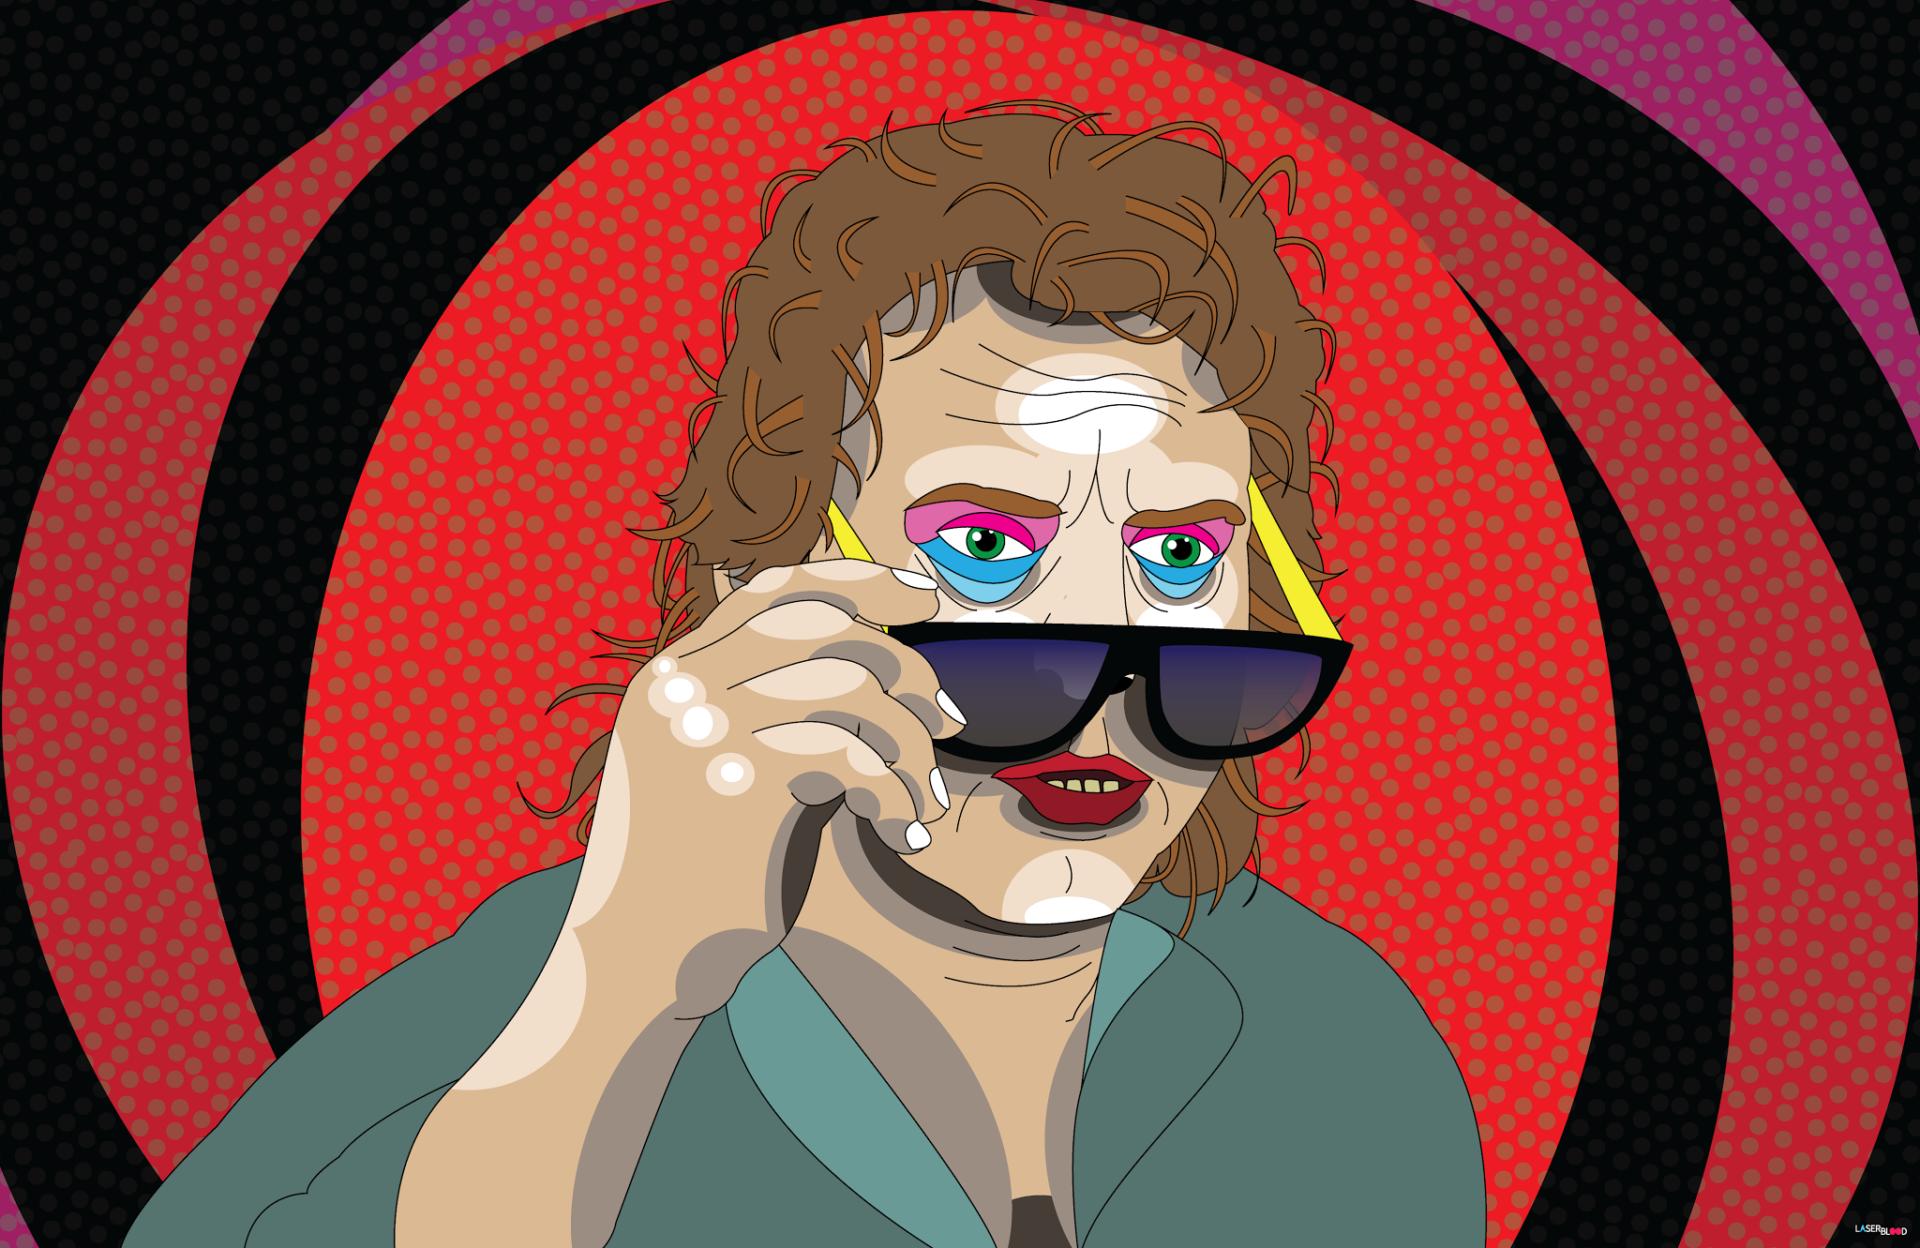 All Outta Bubblegum by Corey Watson